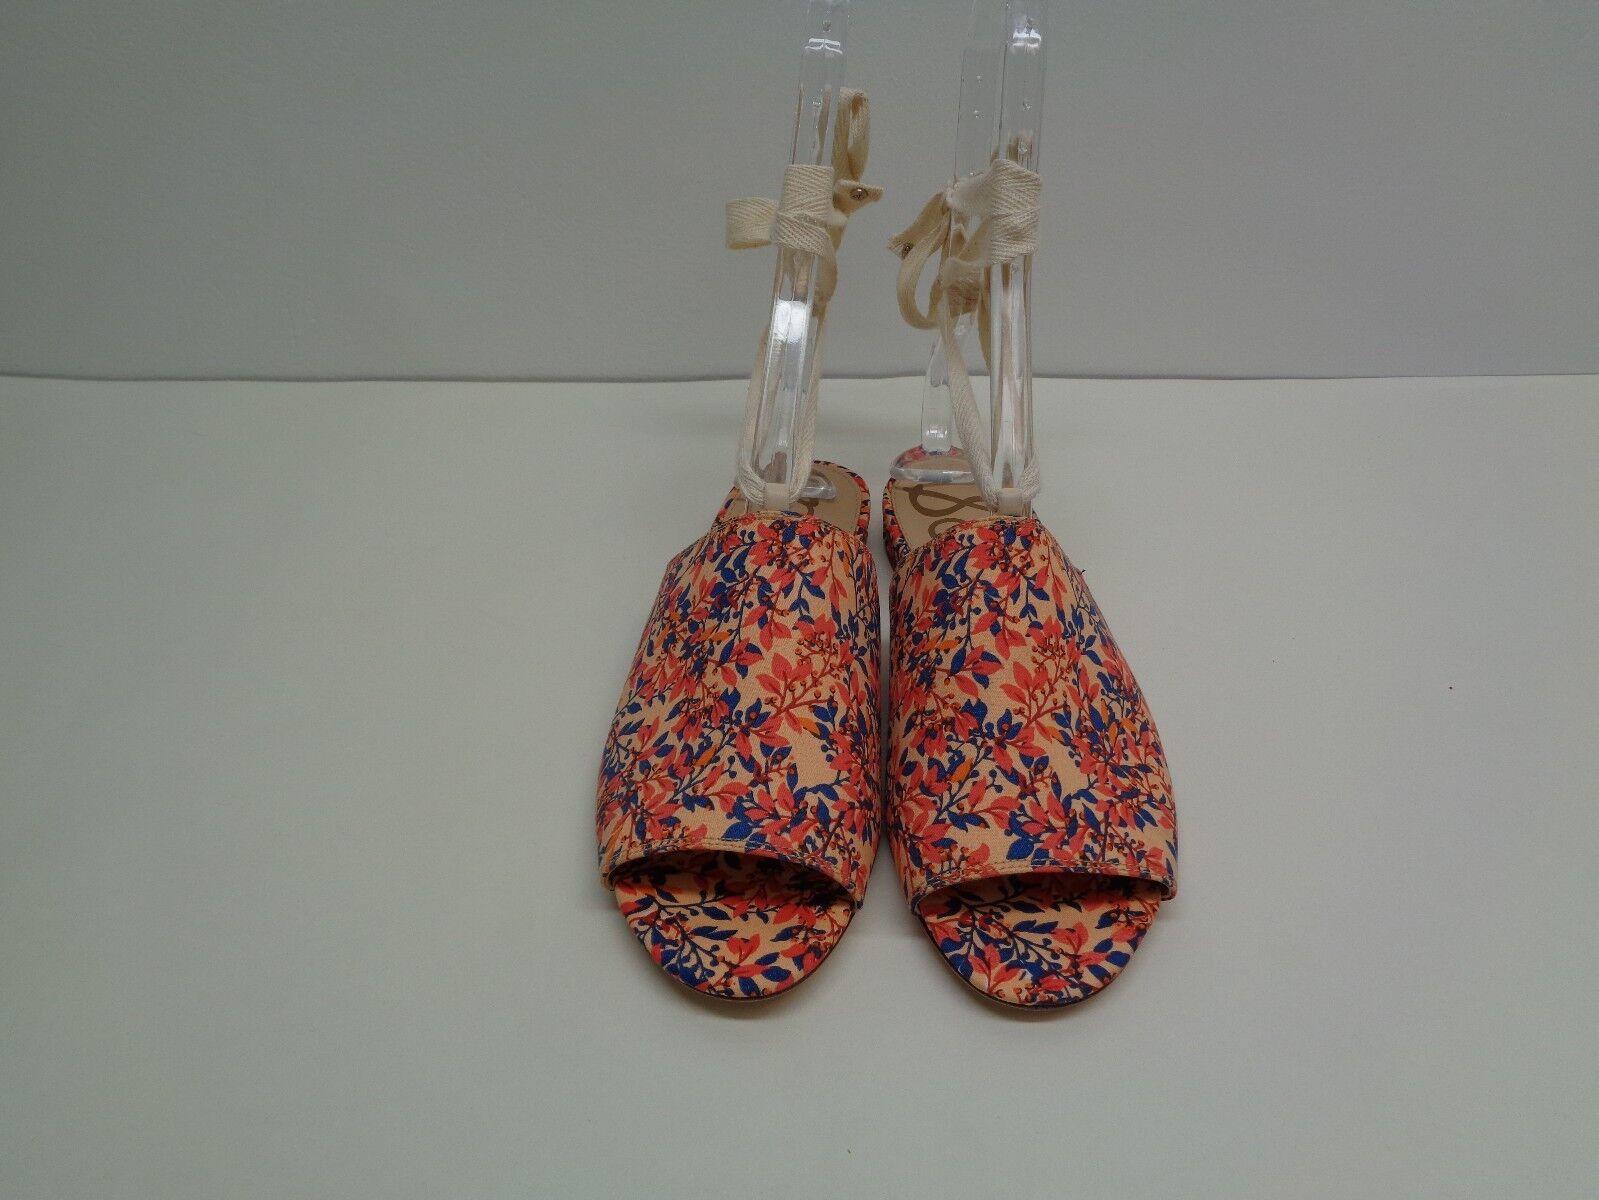 Sam Edelman Größe 7 Fabric M TAI Coral Fabric 7 Ankle Wrap Sandales New Damenschuhe Schuhes bfc371